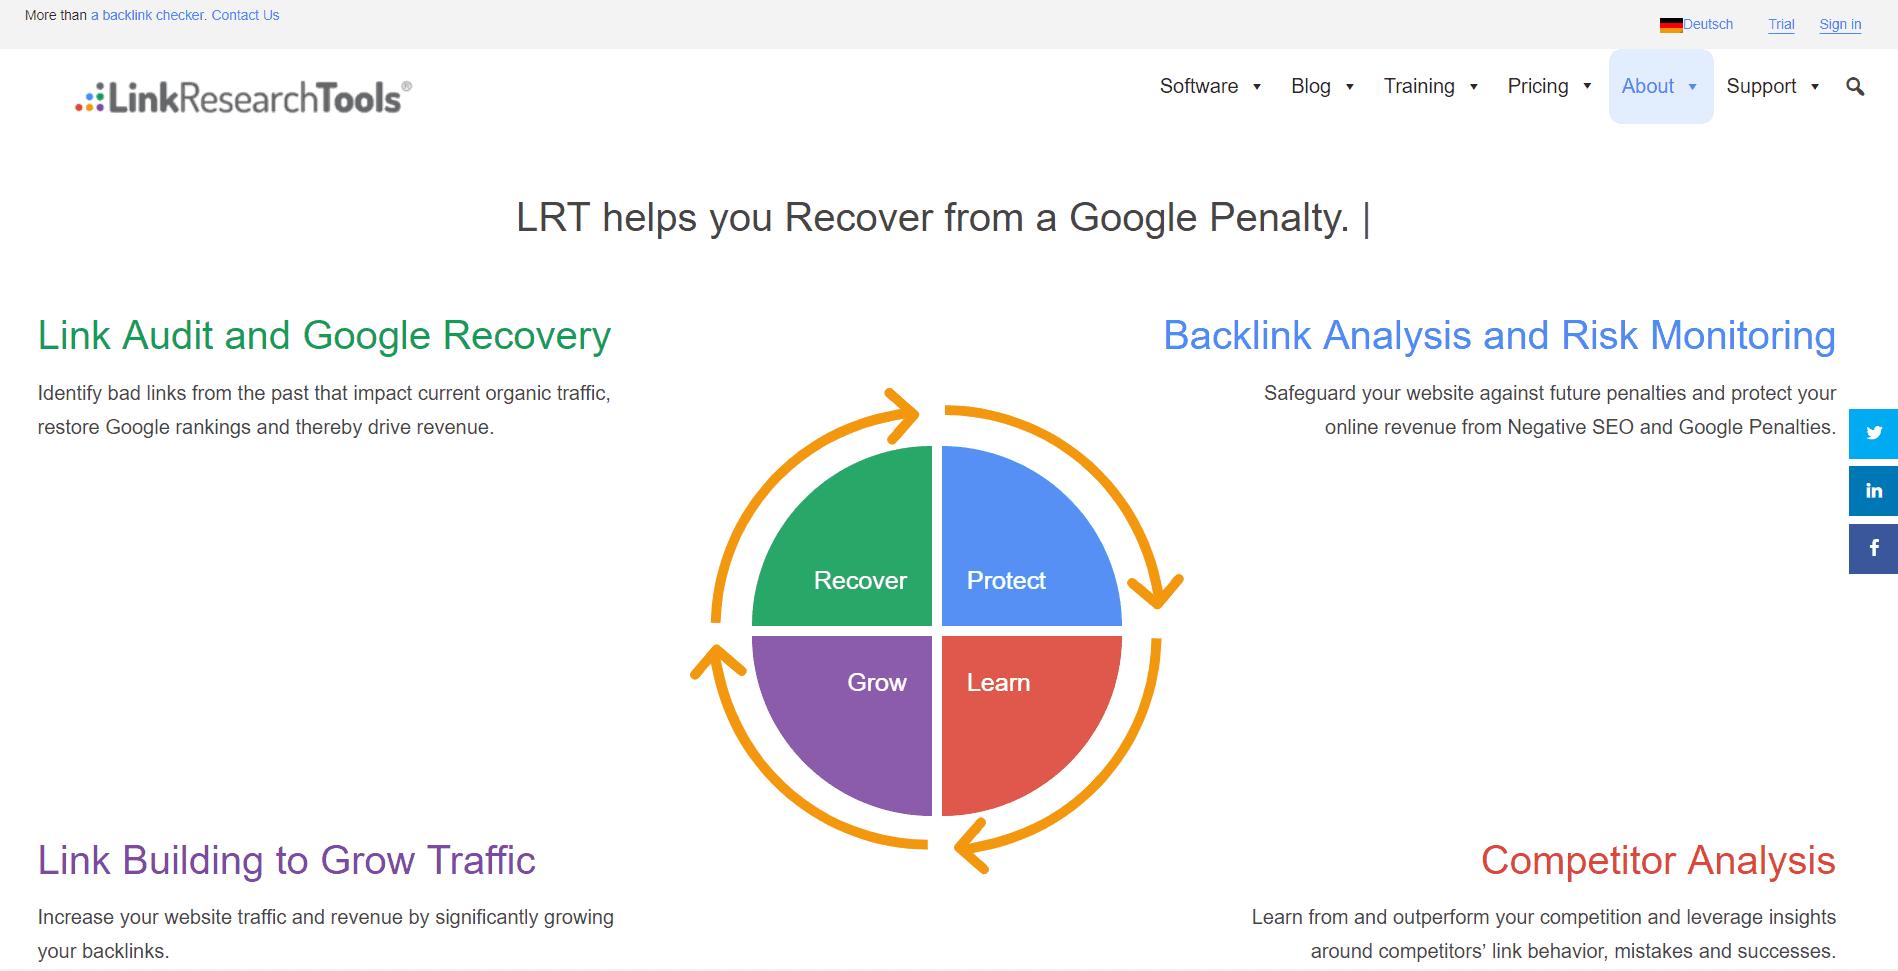 LinkResearchTools Backlink Analysis Tool